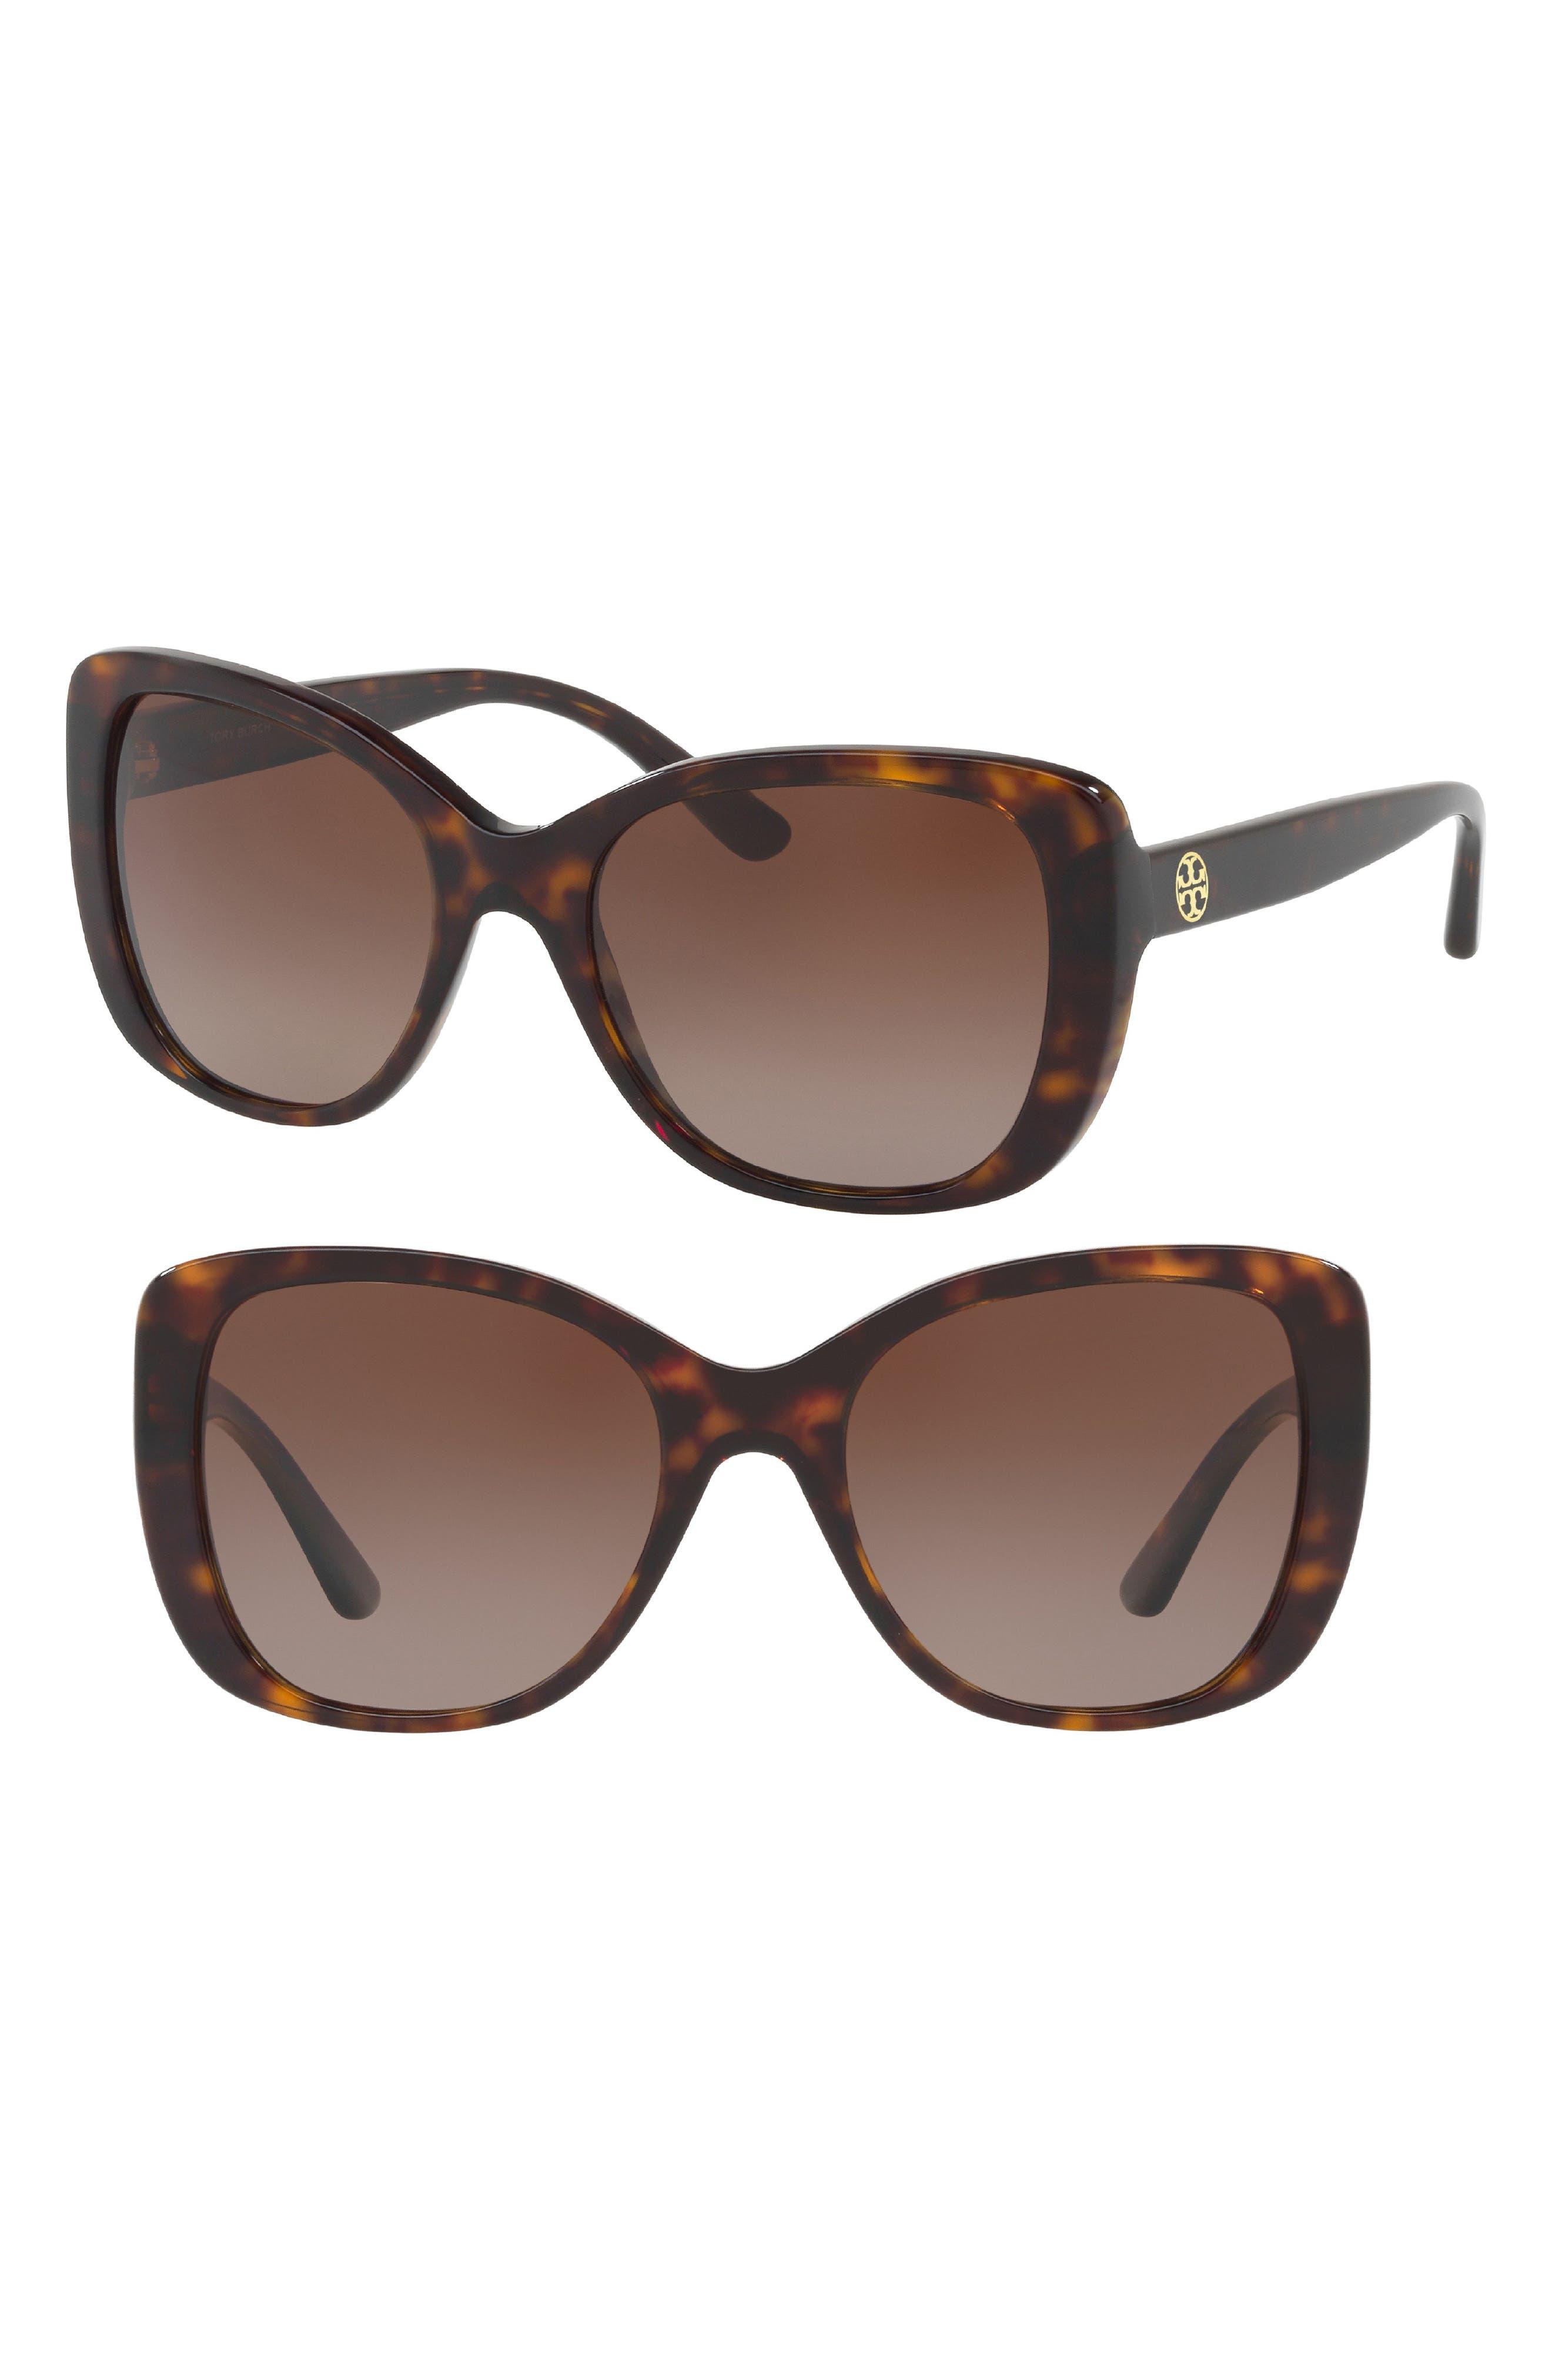 53mm Polarized Rectangle Sunglasses,                             Main thumbnail 1, color,                             Gold/ Green